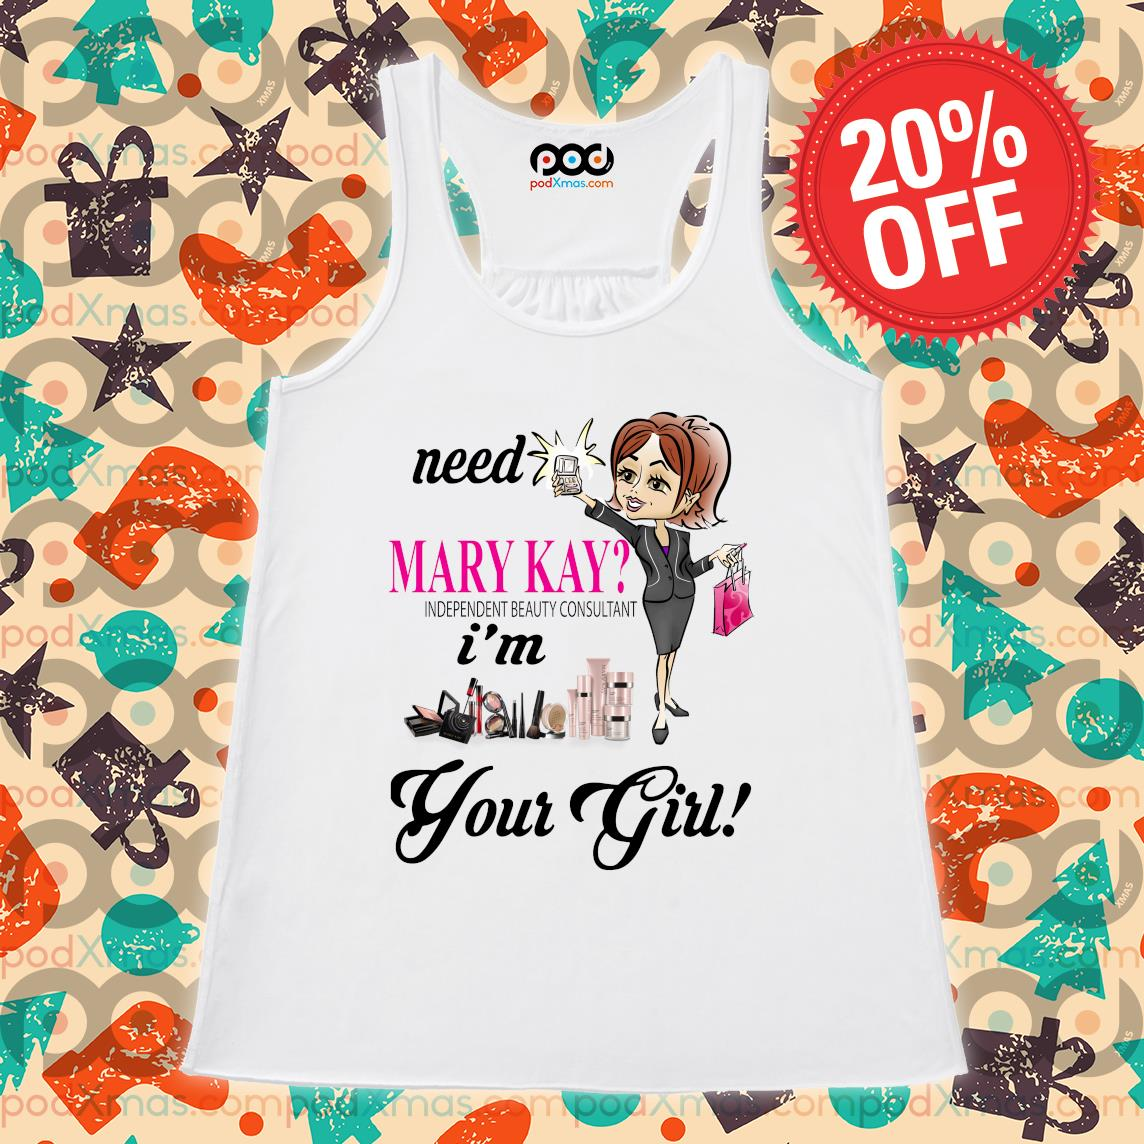 Need Mary Kay independent beauty consultant i'm your girl s Flowy tank PODxmas trang